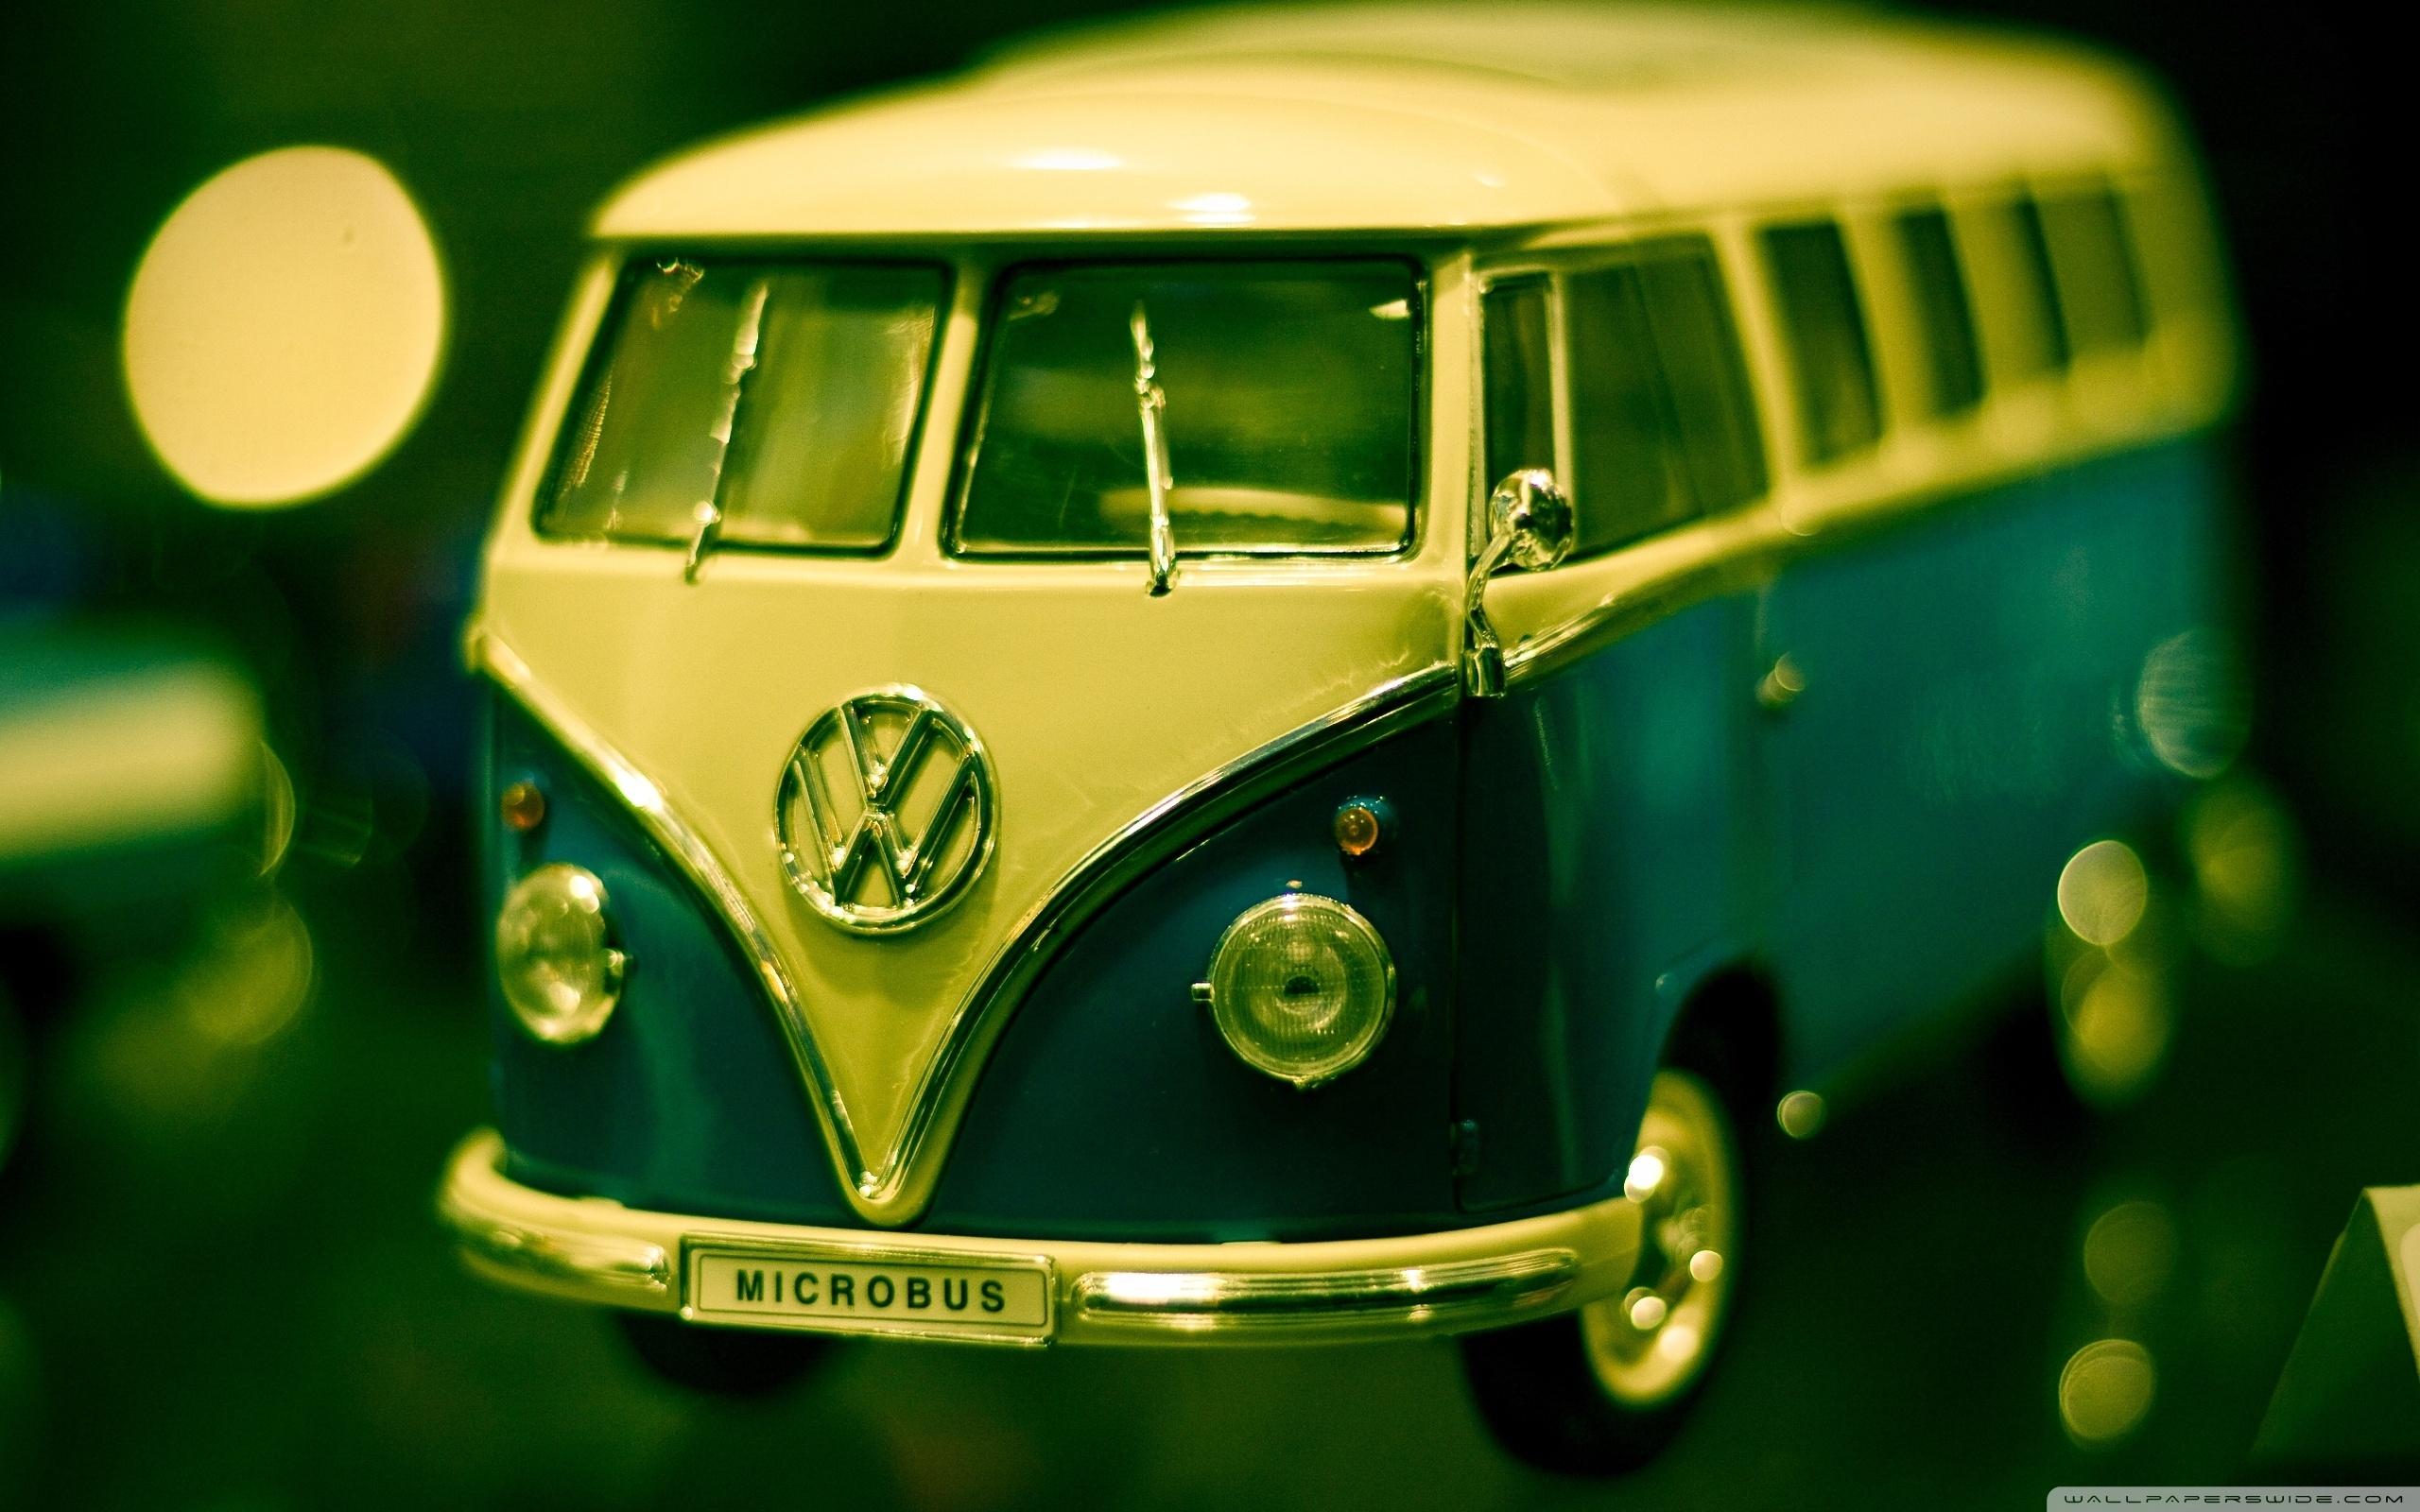 bus toy wallpaper 2560x1600 magic4walls volkswagen bus toy wallpaper 2560x1600